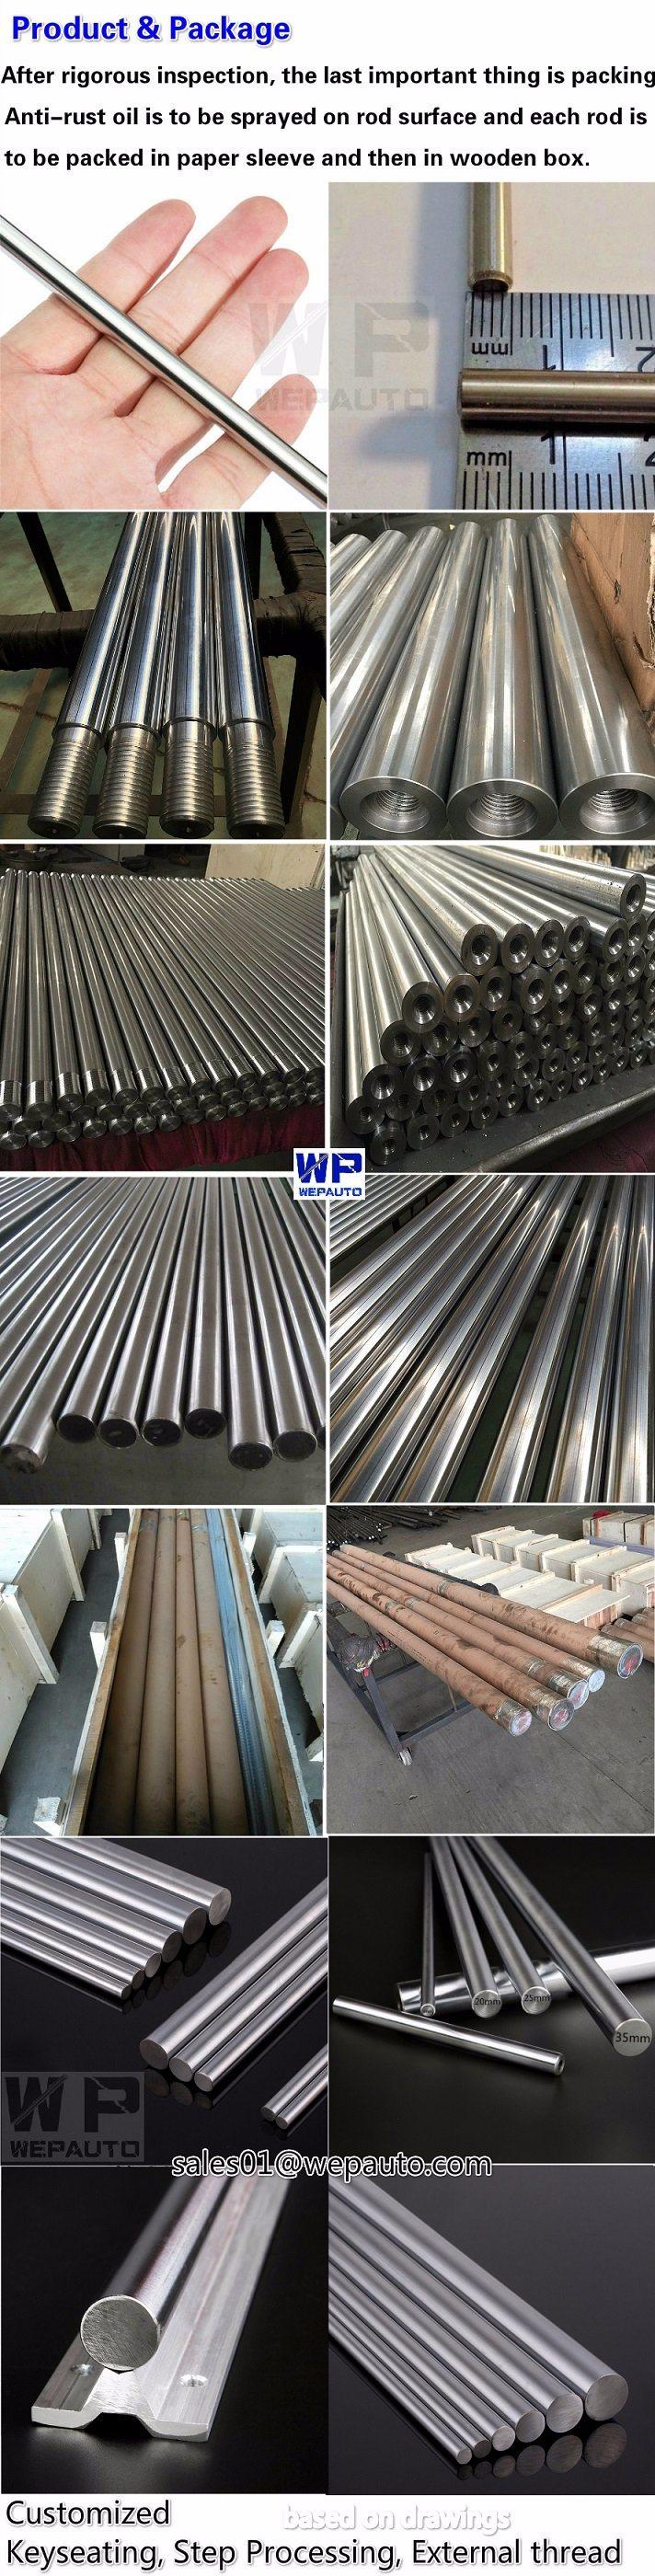 Steel Round Plated Chrome Bar Ck45-Dia 20mm